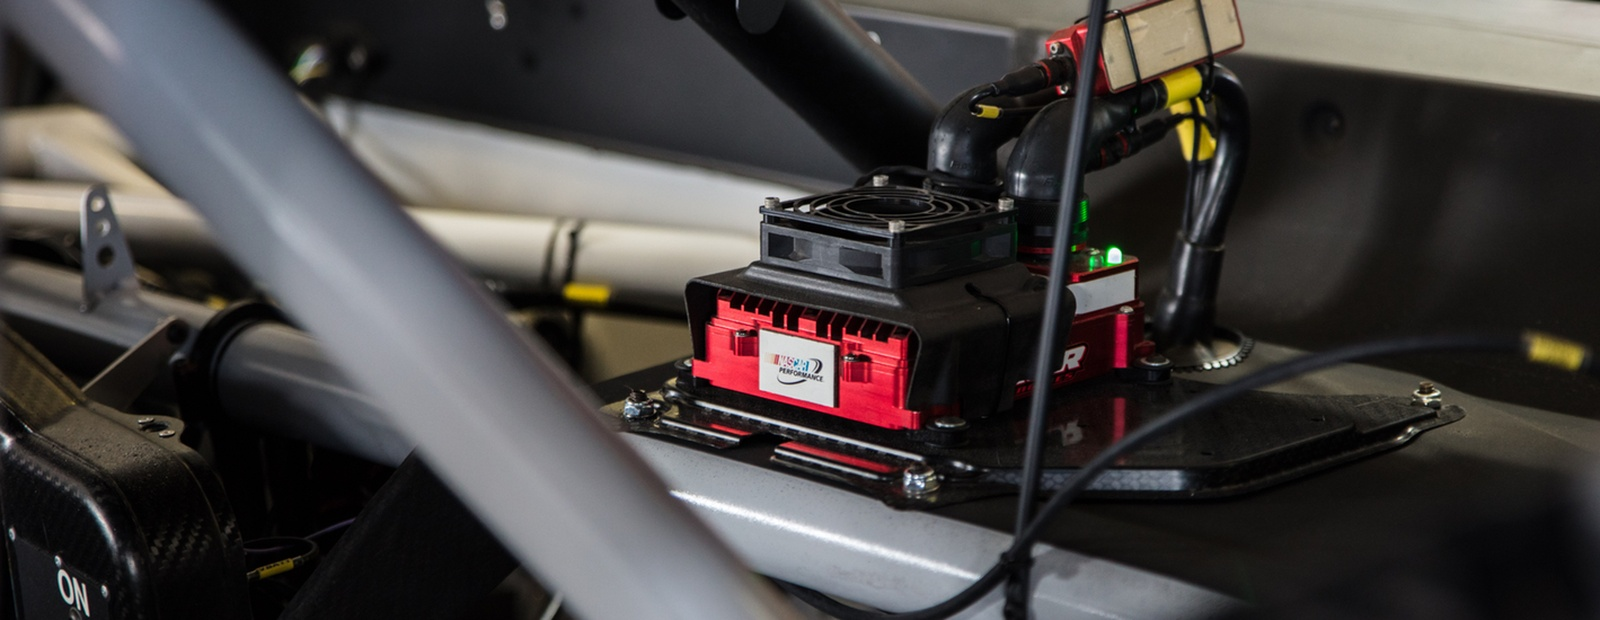 NASCAR ECU